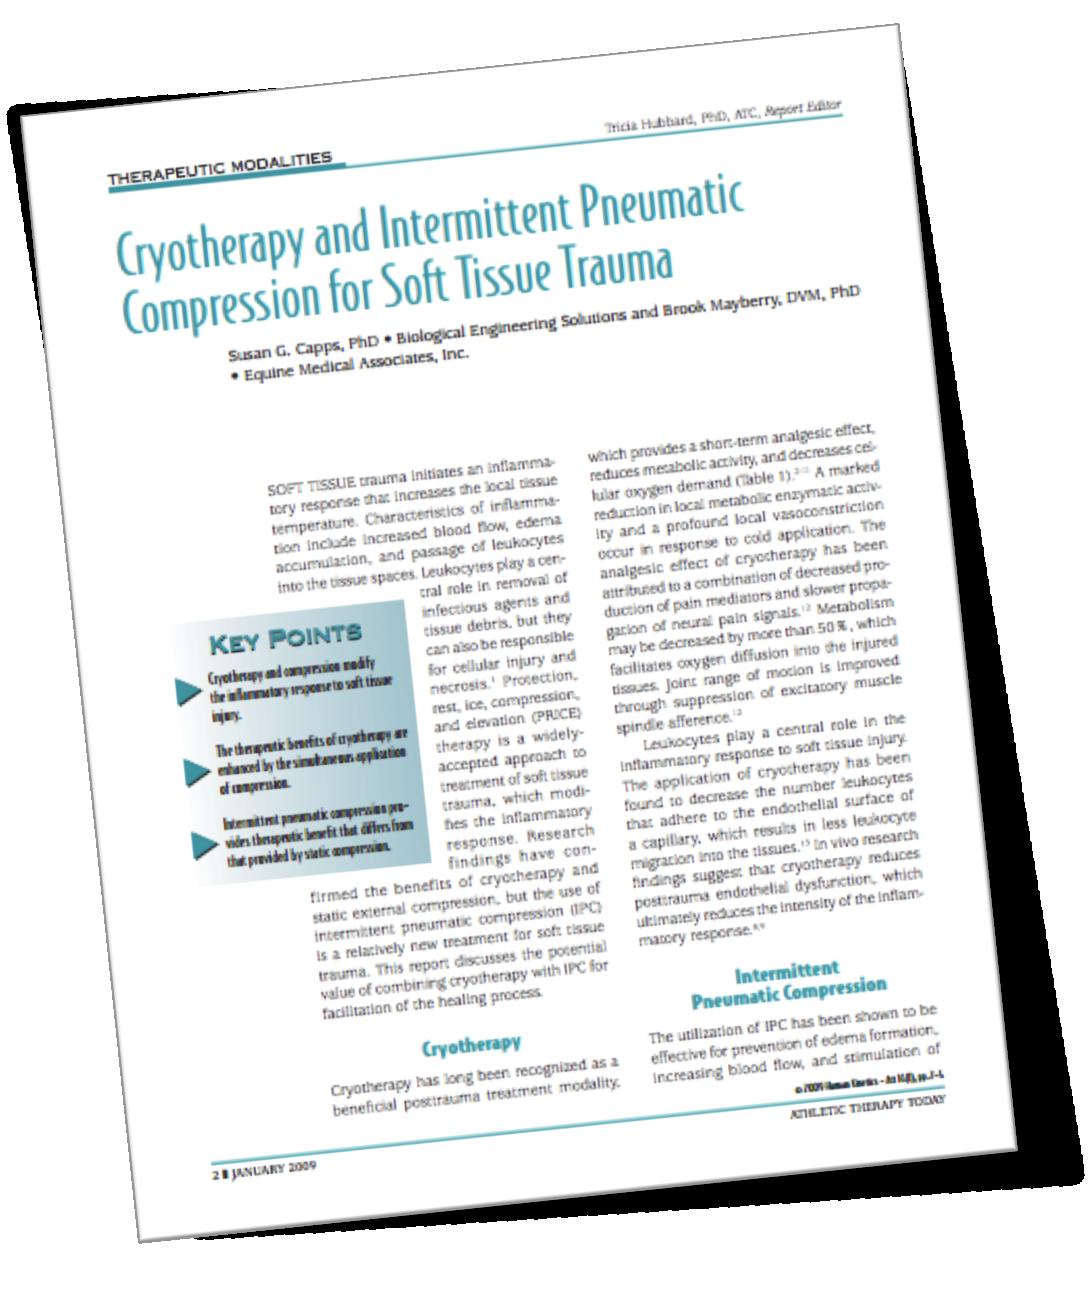 cryotherapy-intermitten-pneumatic-compression-whitepaper